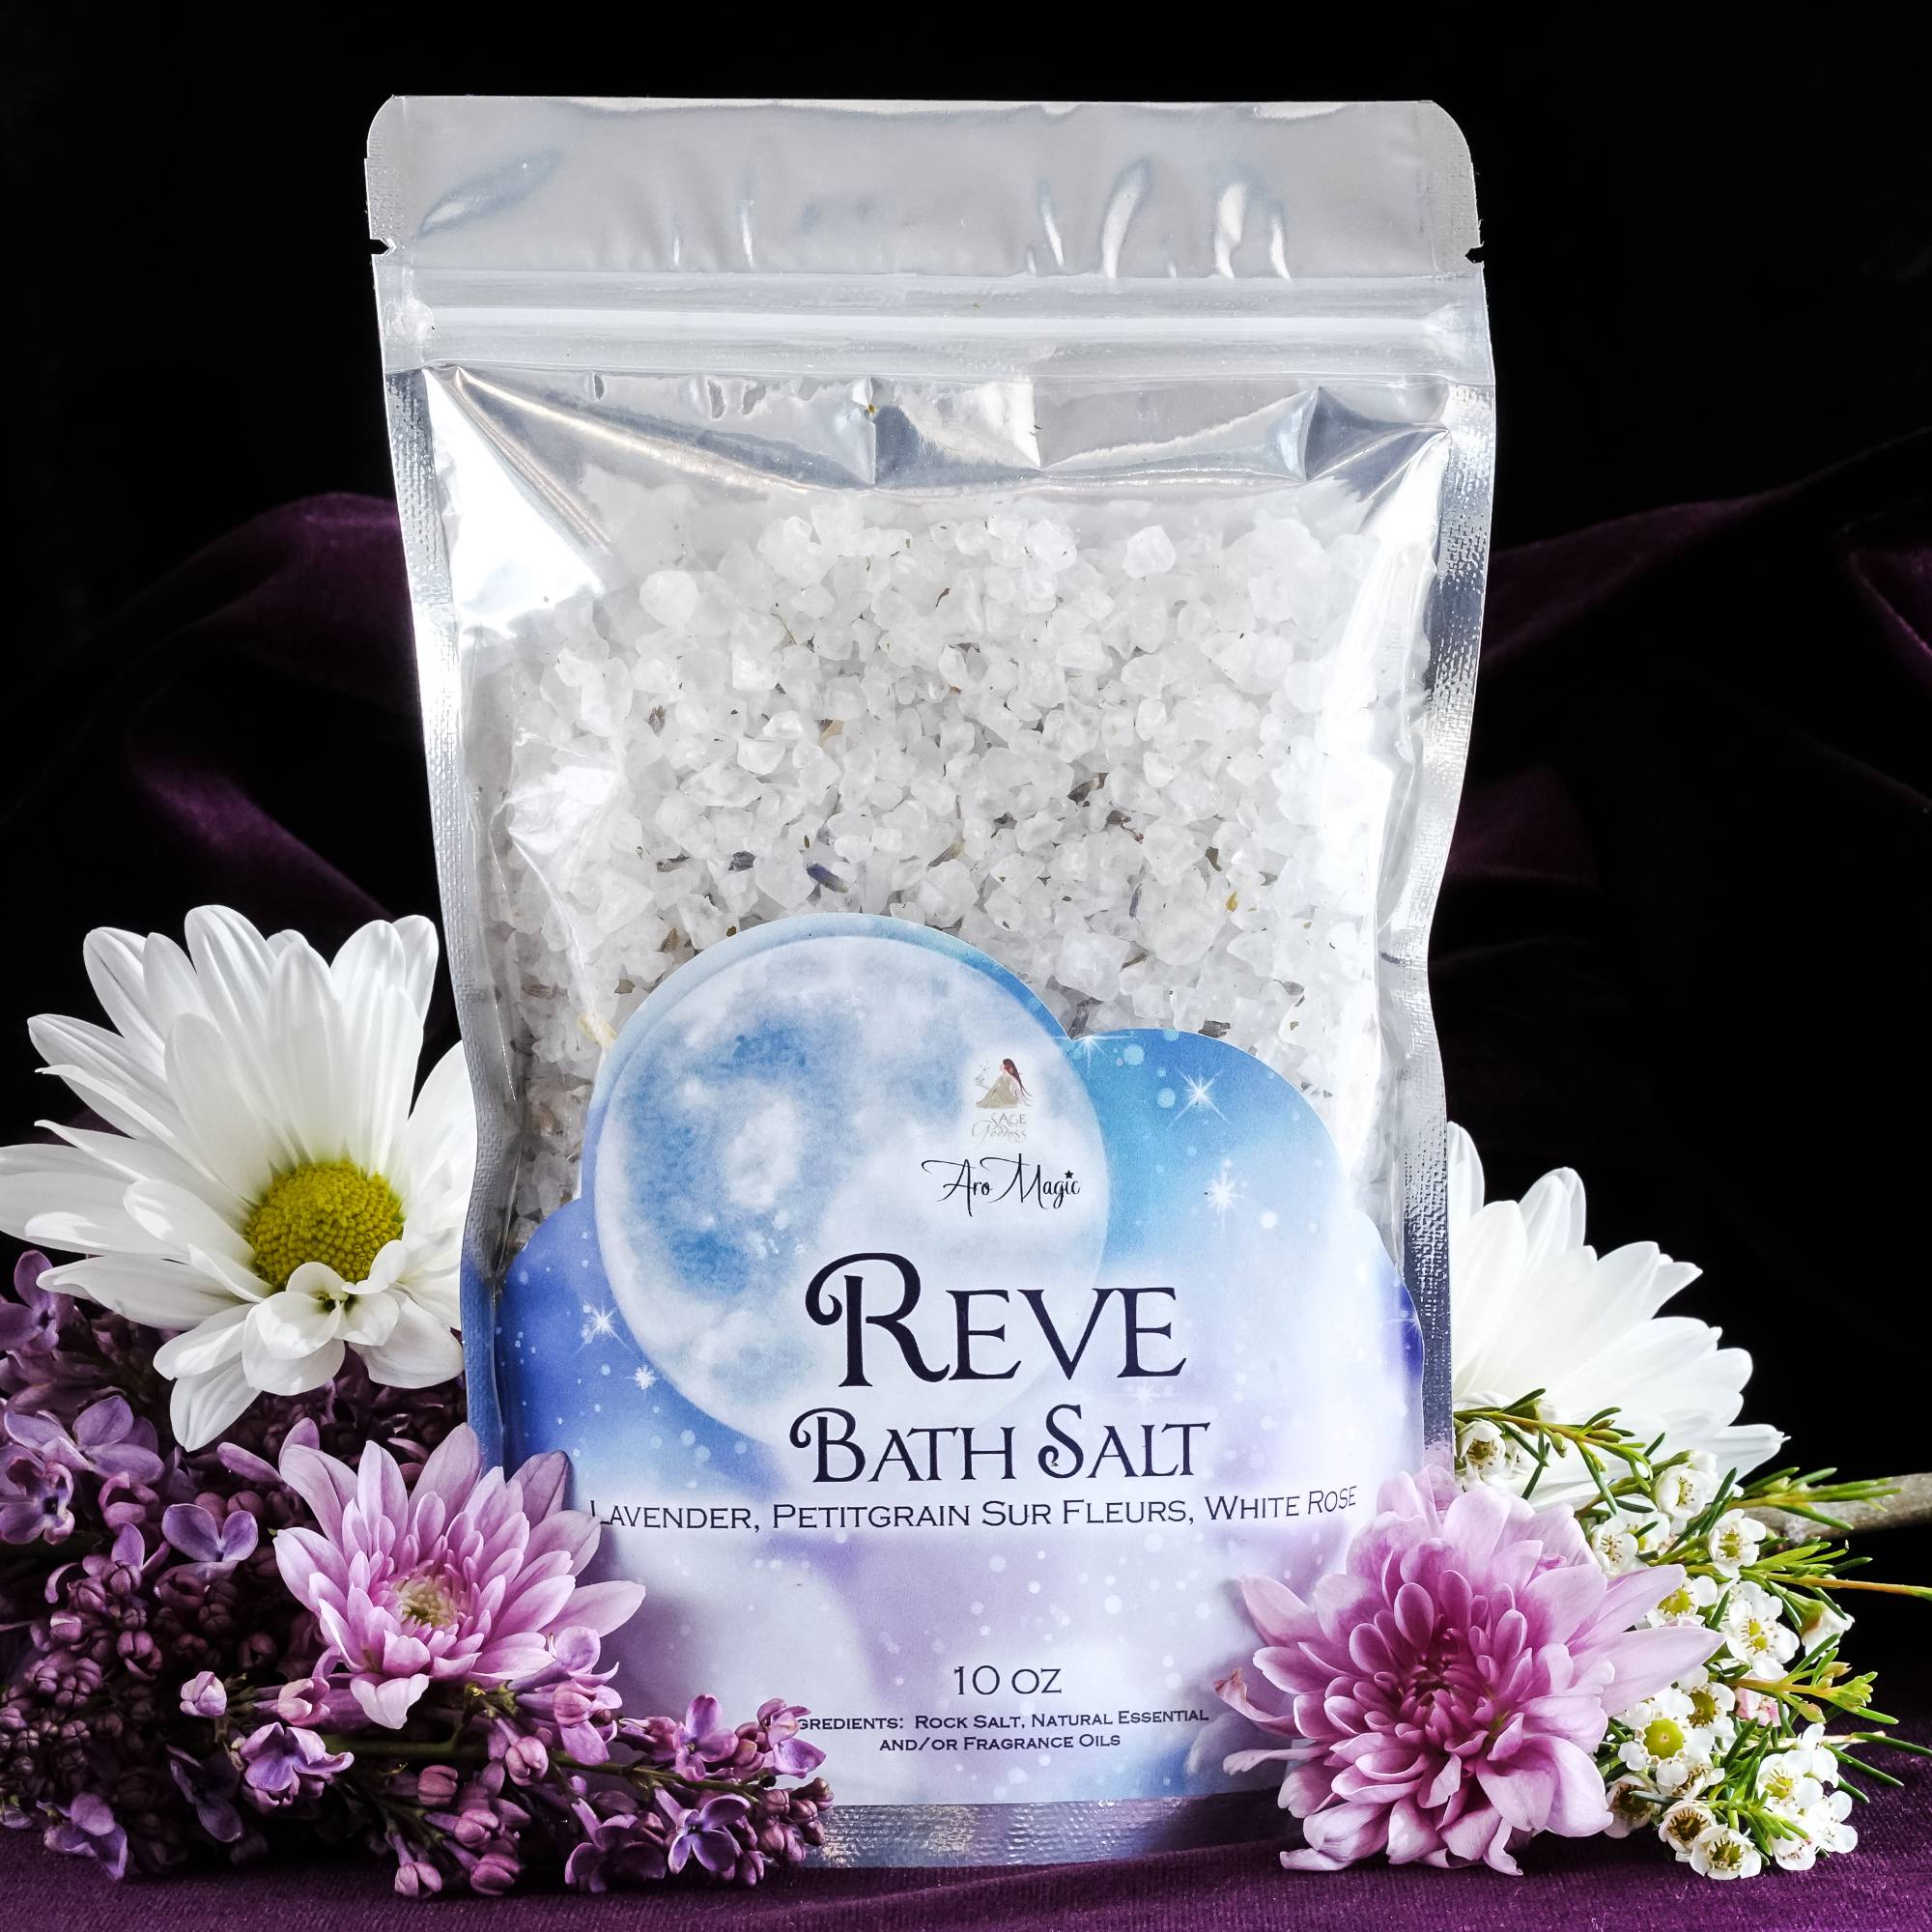 reve bath salts